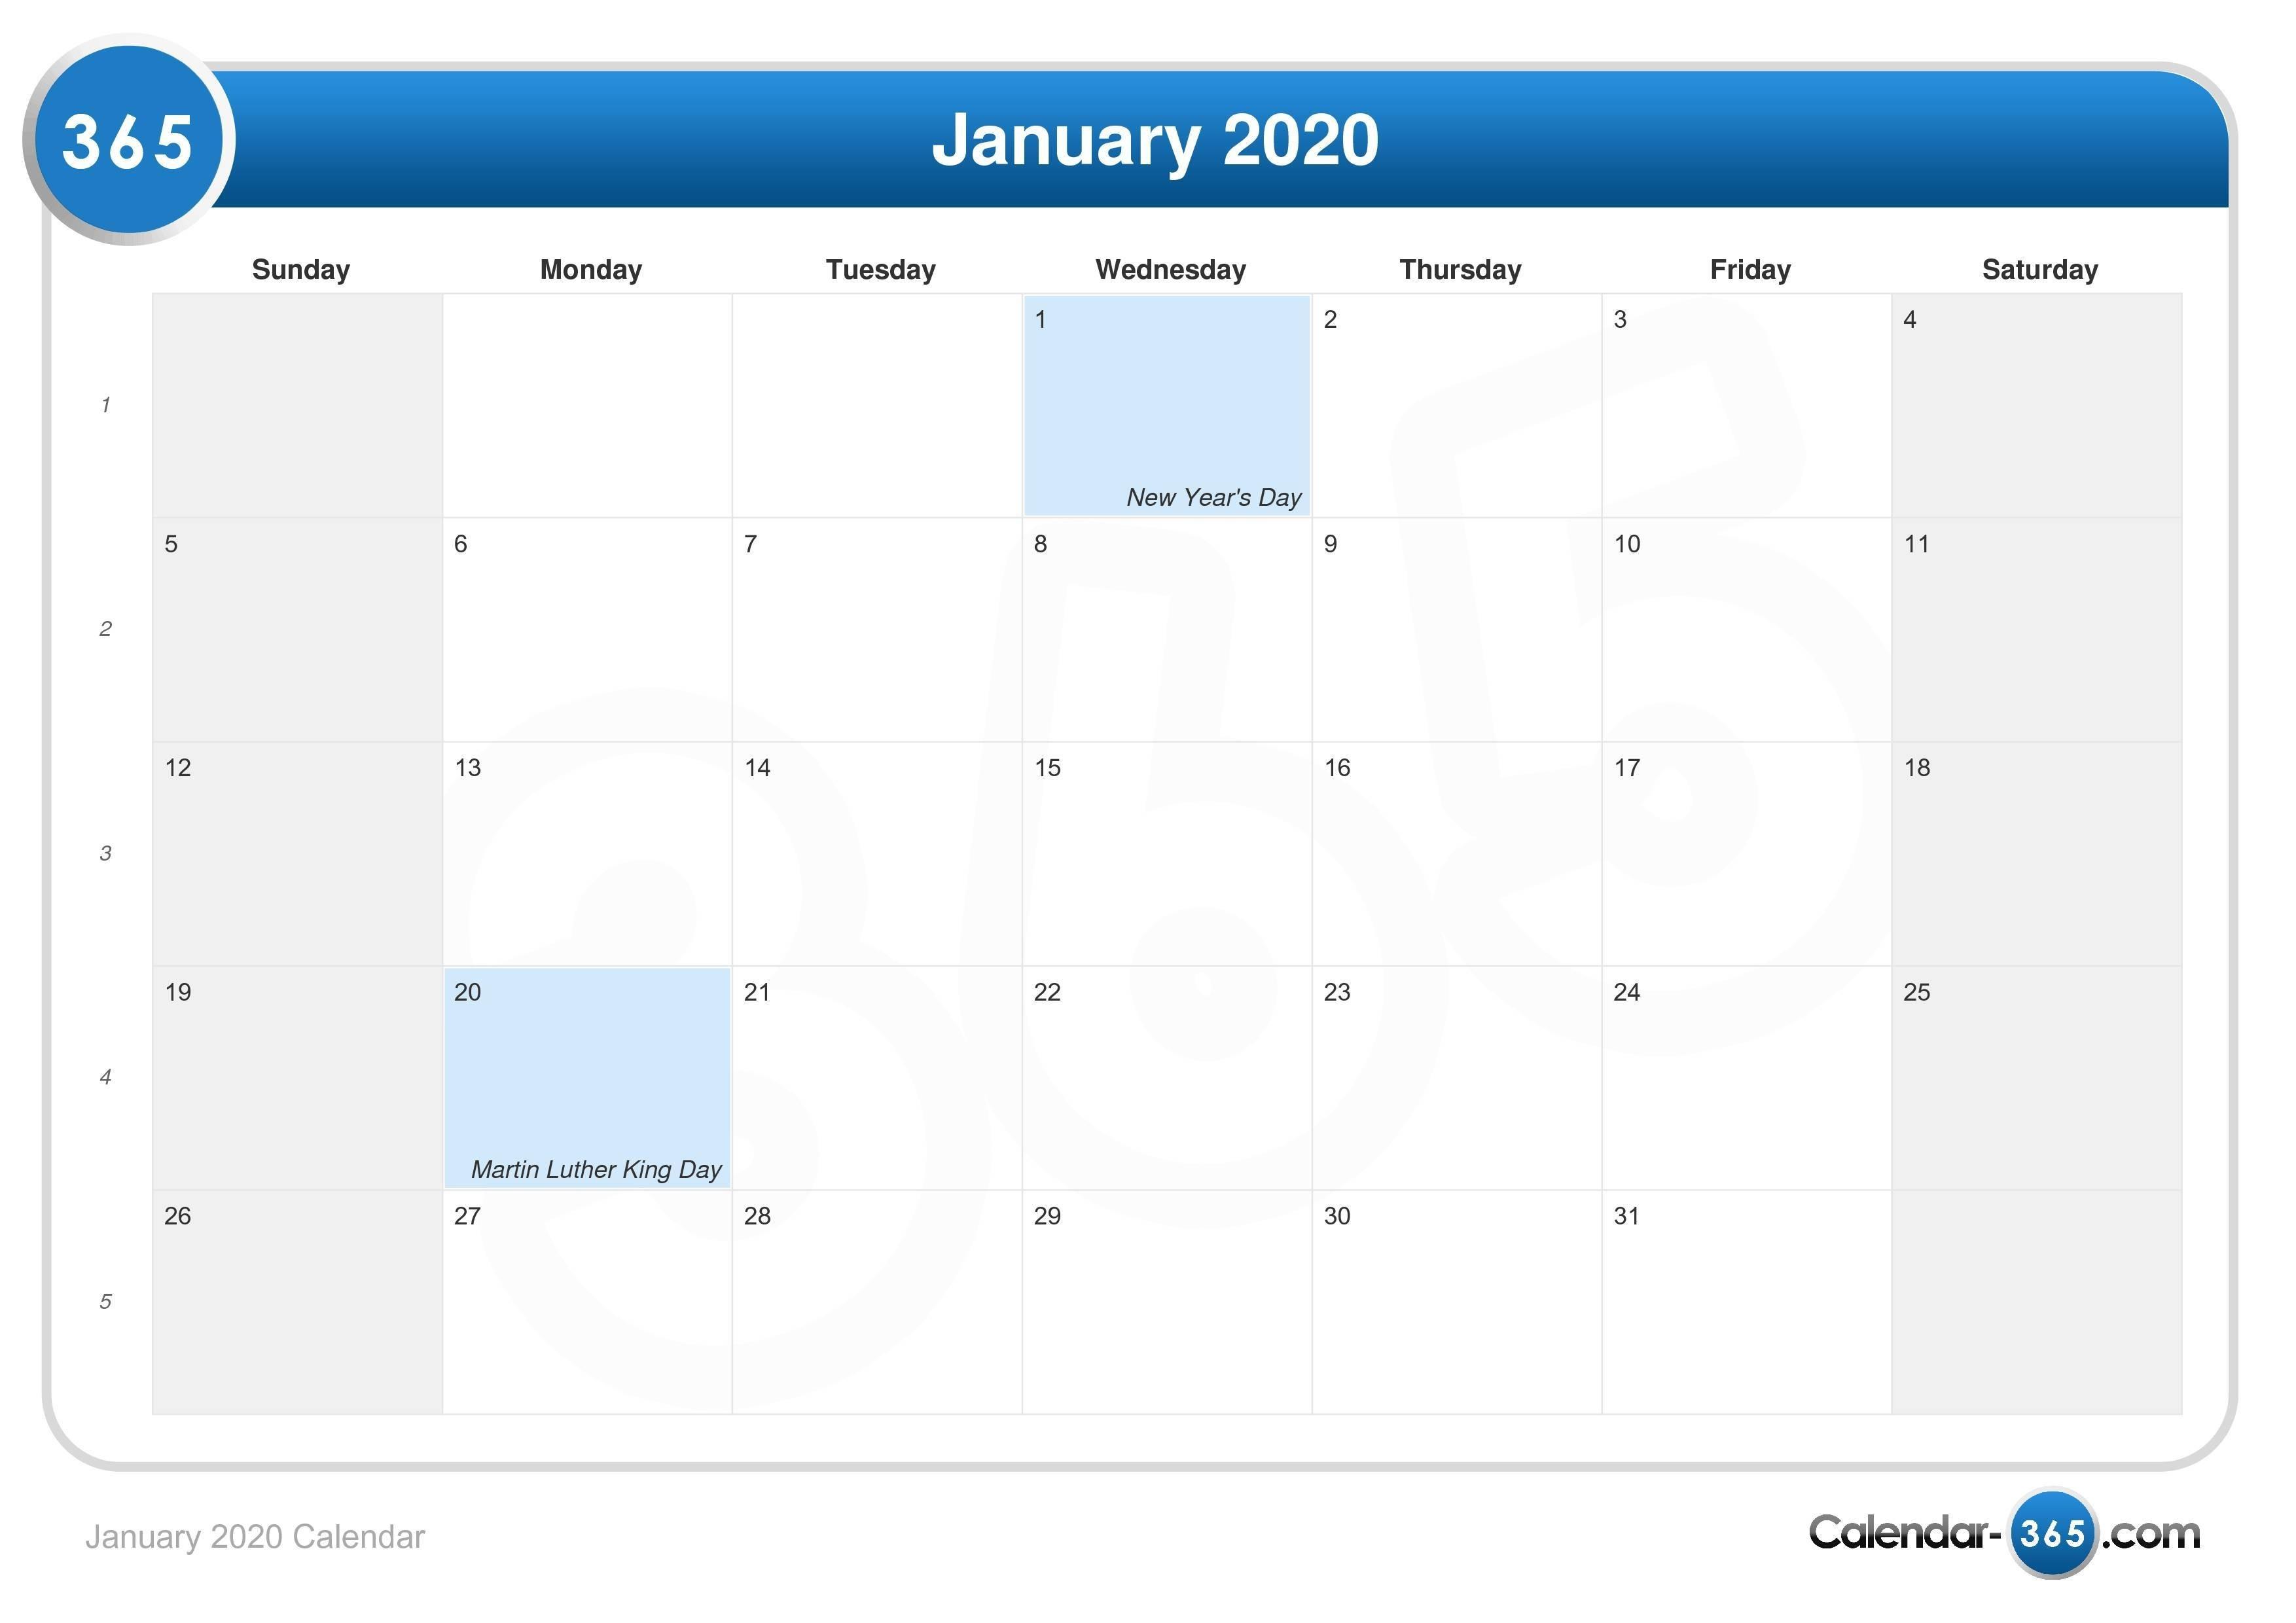 January 2020 Calendar-Show Me A Calendar Of January 2020